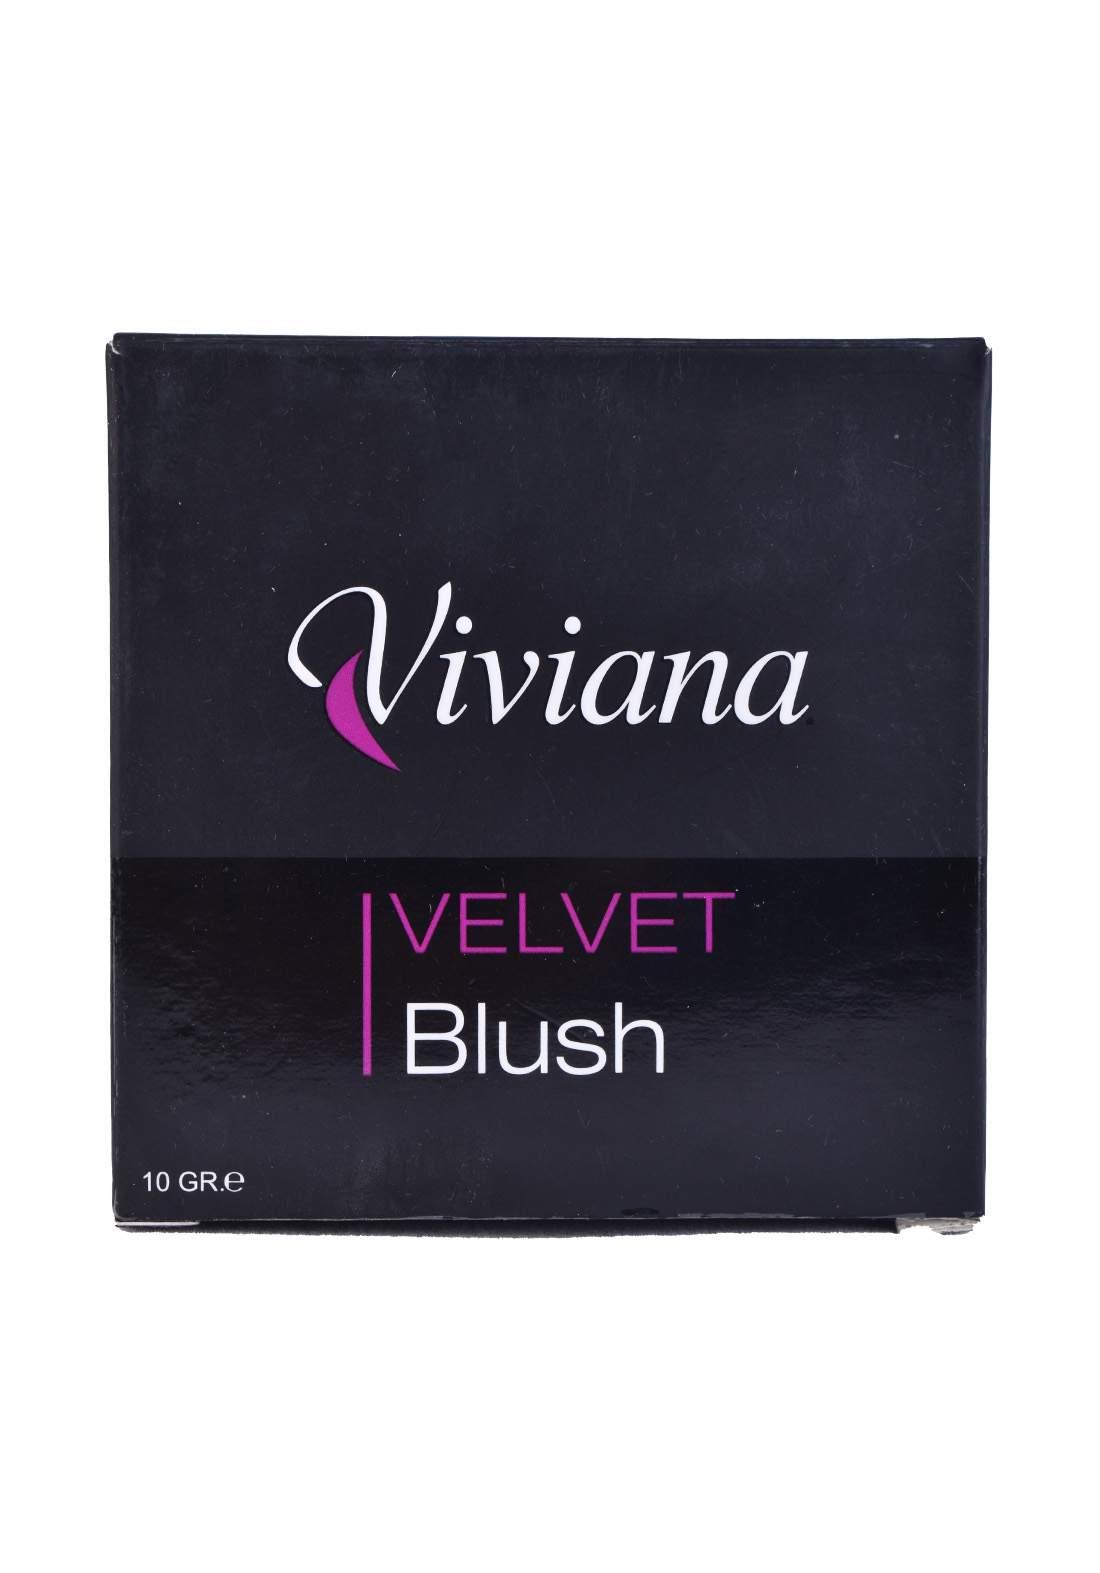 Viviana Velvet Blush No.5 10g احمر خدود